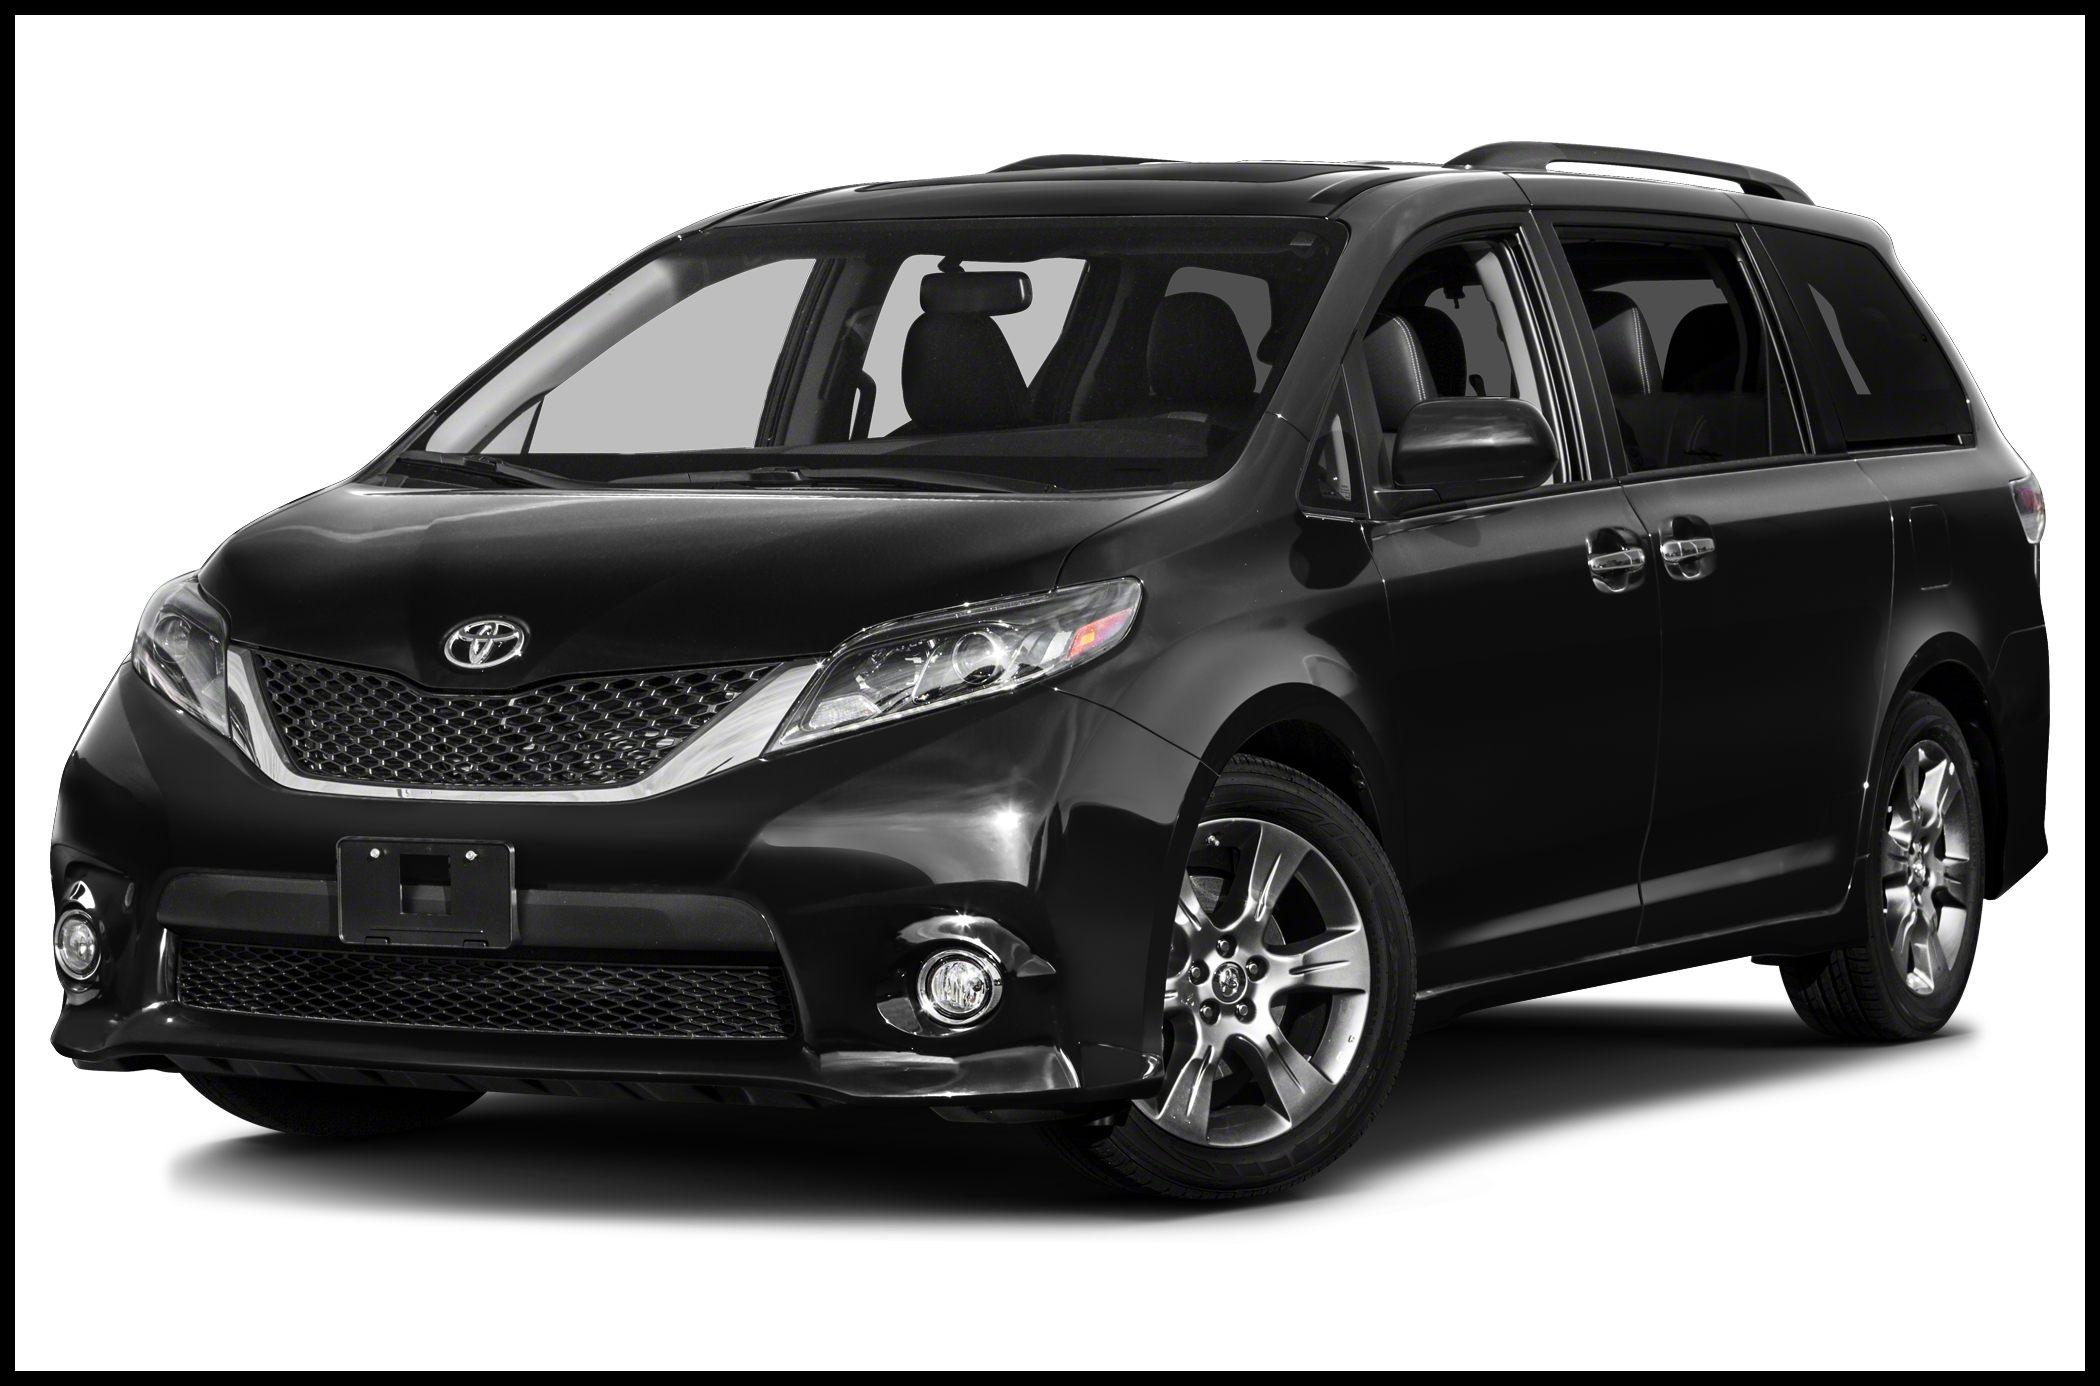 2017 Toyota Sienna SE Premium 8 Passenger 4dr Front wheel Drive Passenger Van Specs and Prices